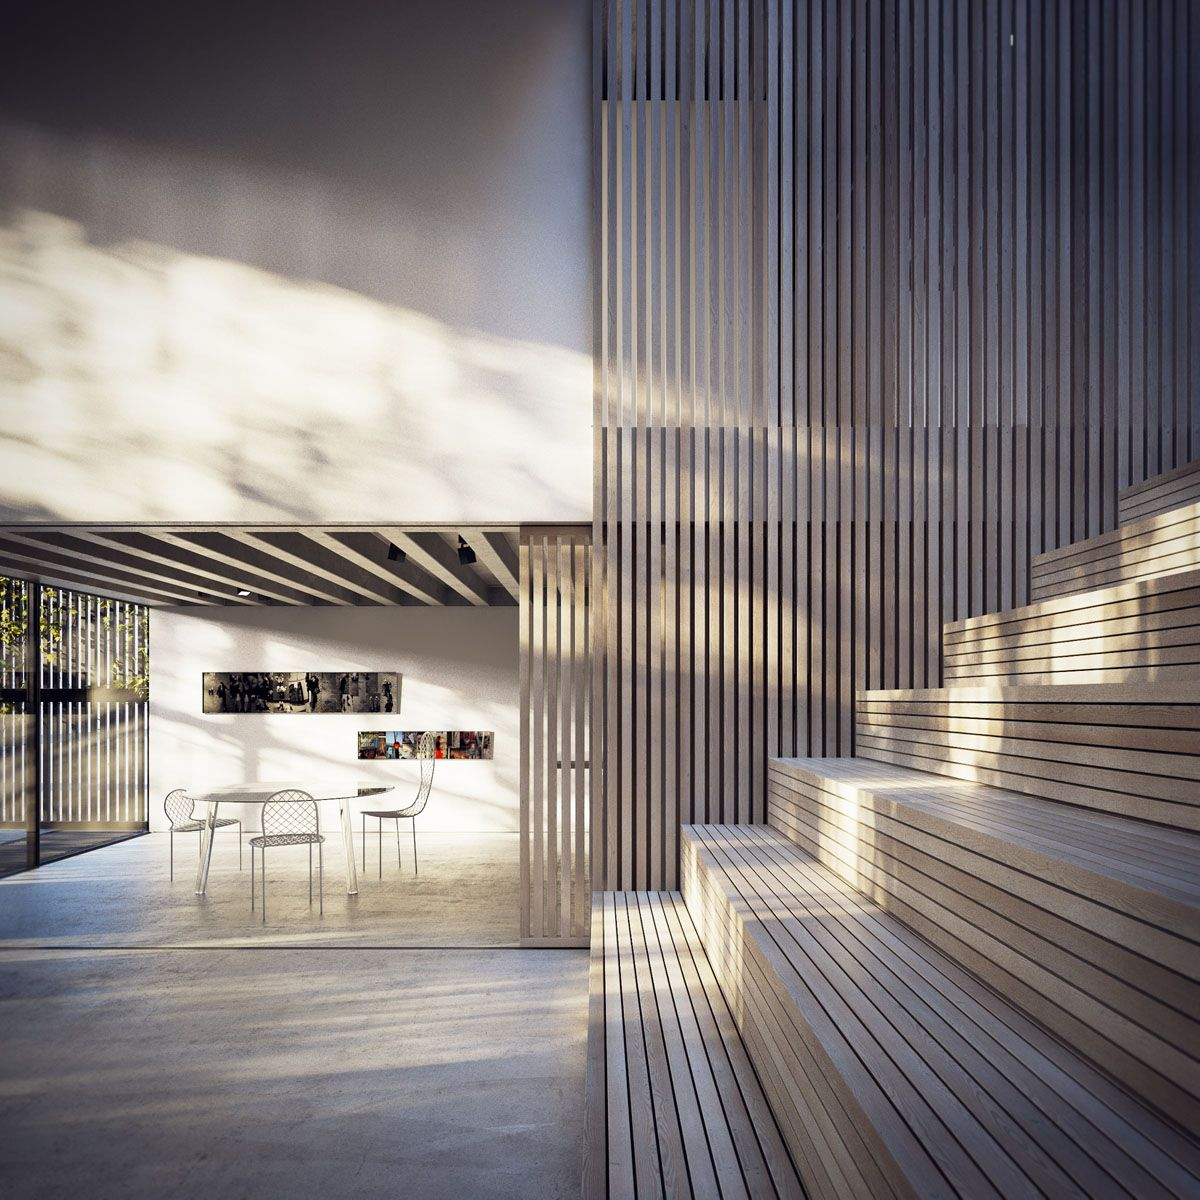 Architecture Interior Design Peter Guthries Kilburn Vale Visualizations